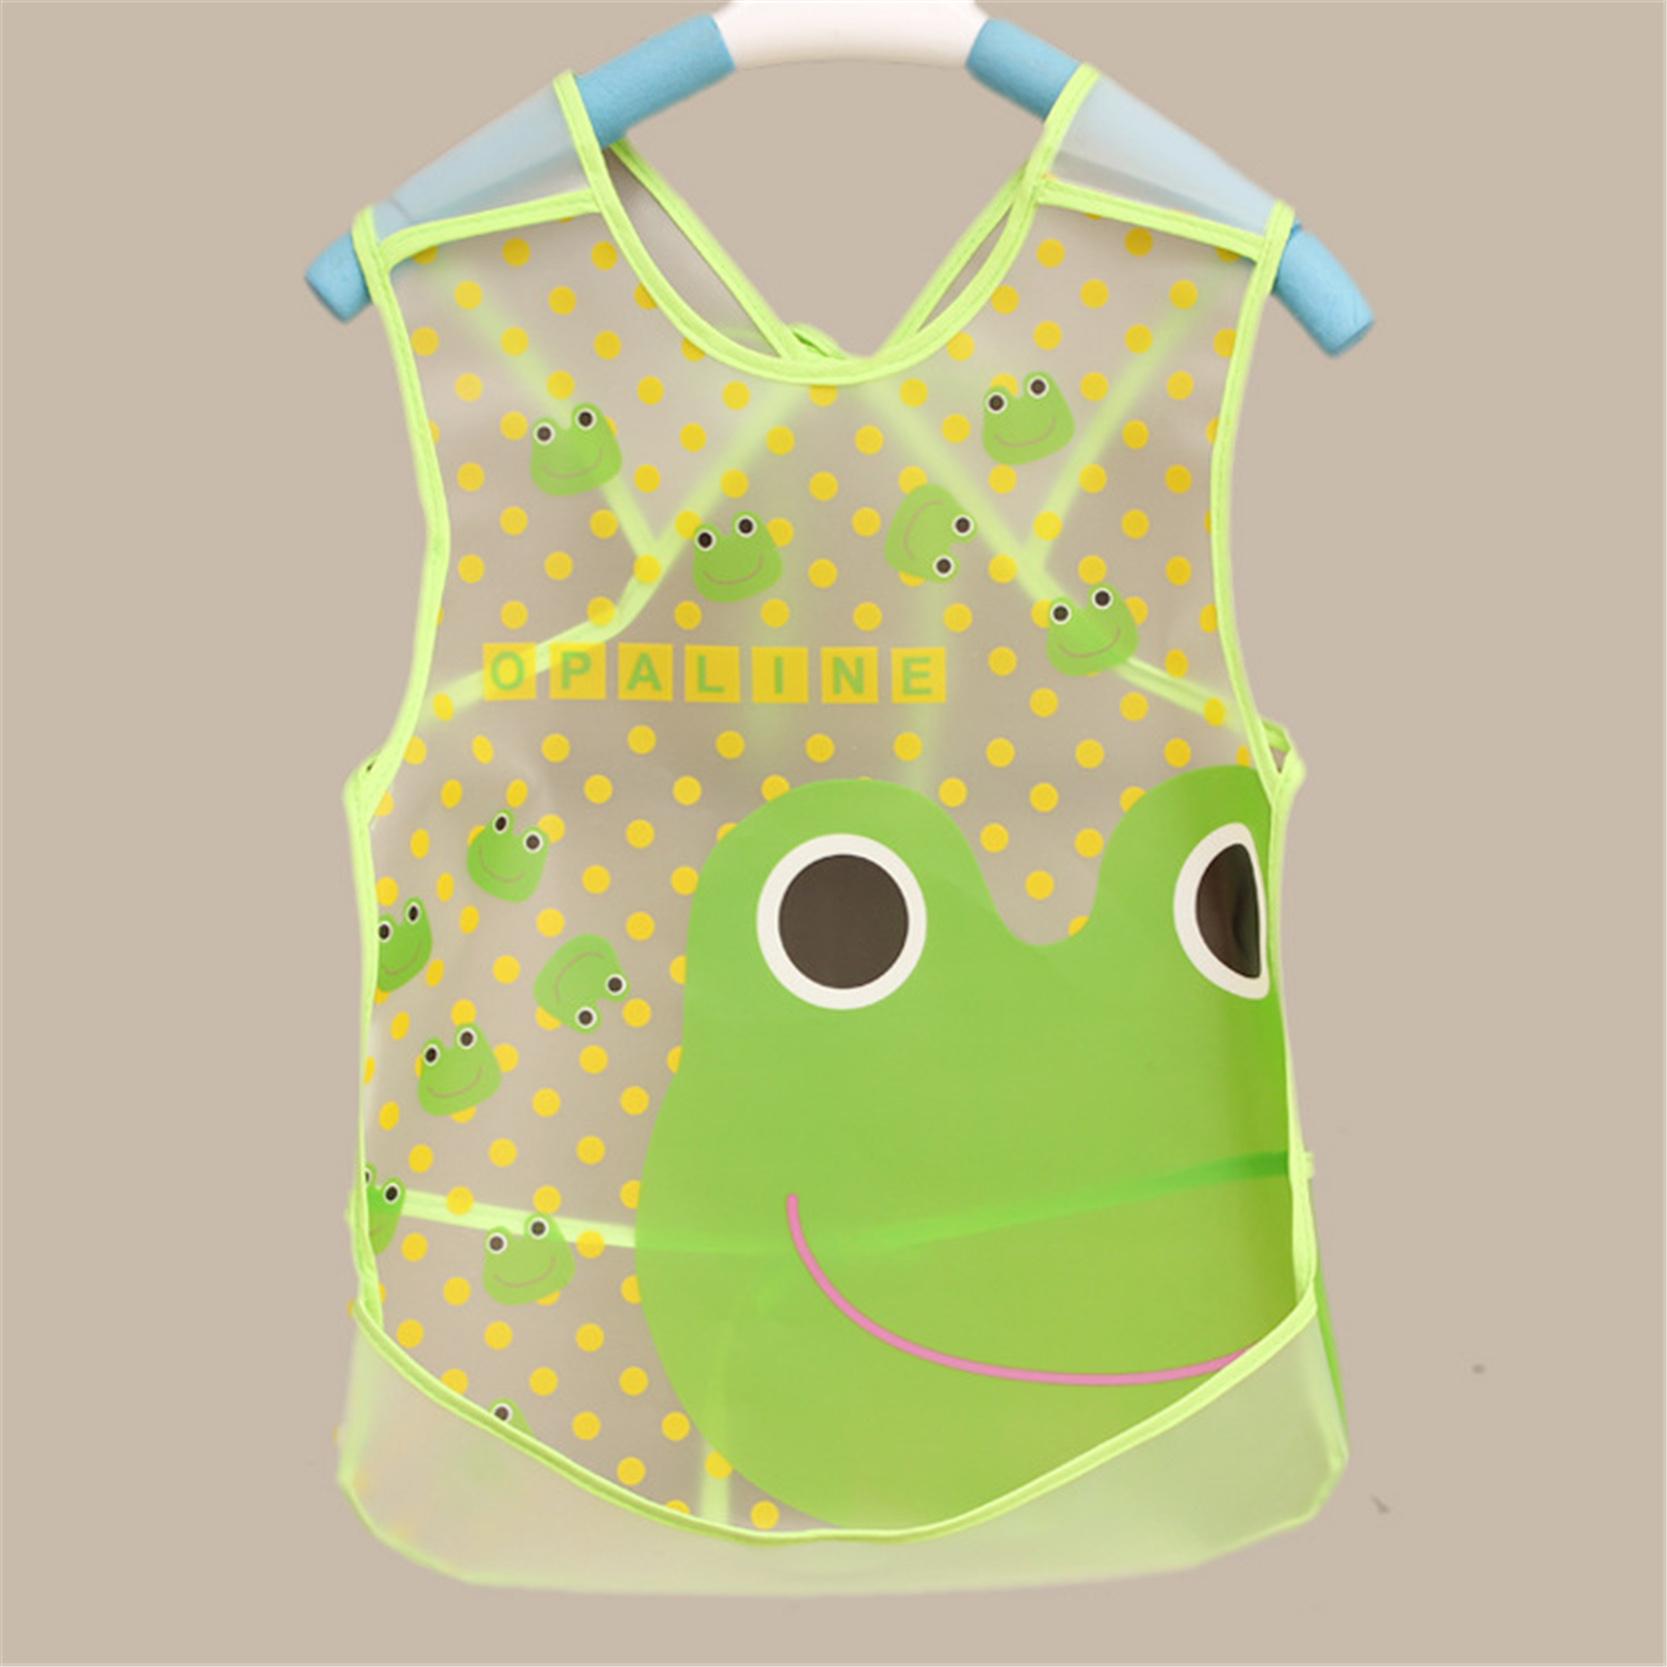 2PCS Lot EVA Cute Baby Bibs Infant Boy Girl Waterproof Transparent Burp Cloths For Children font